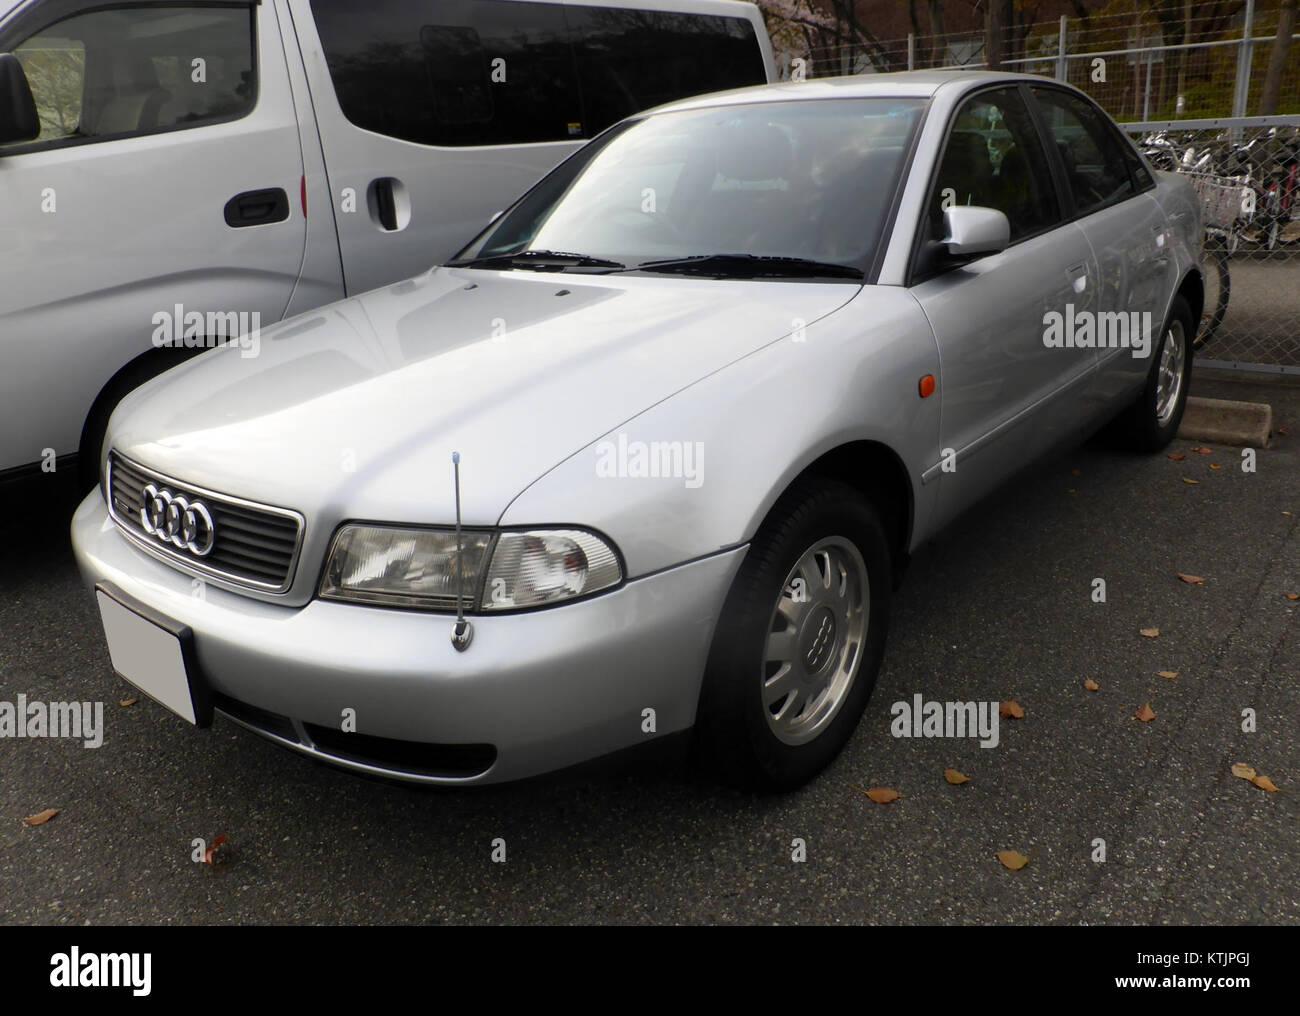 Kelebihan Audi A4 1.8 Review